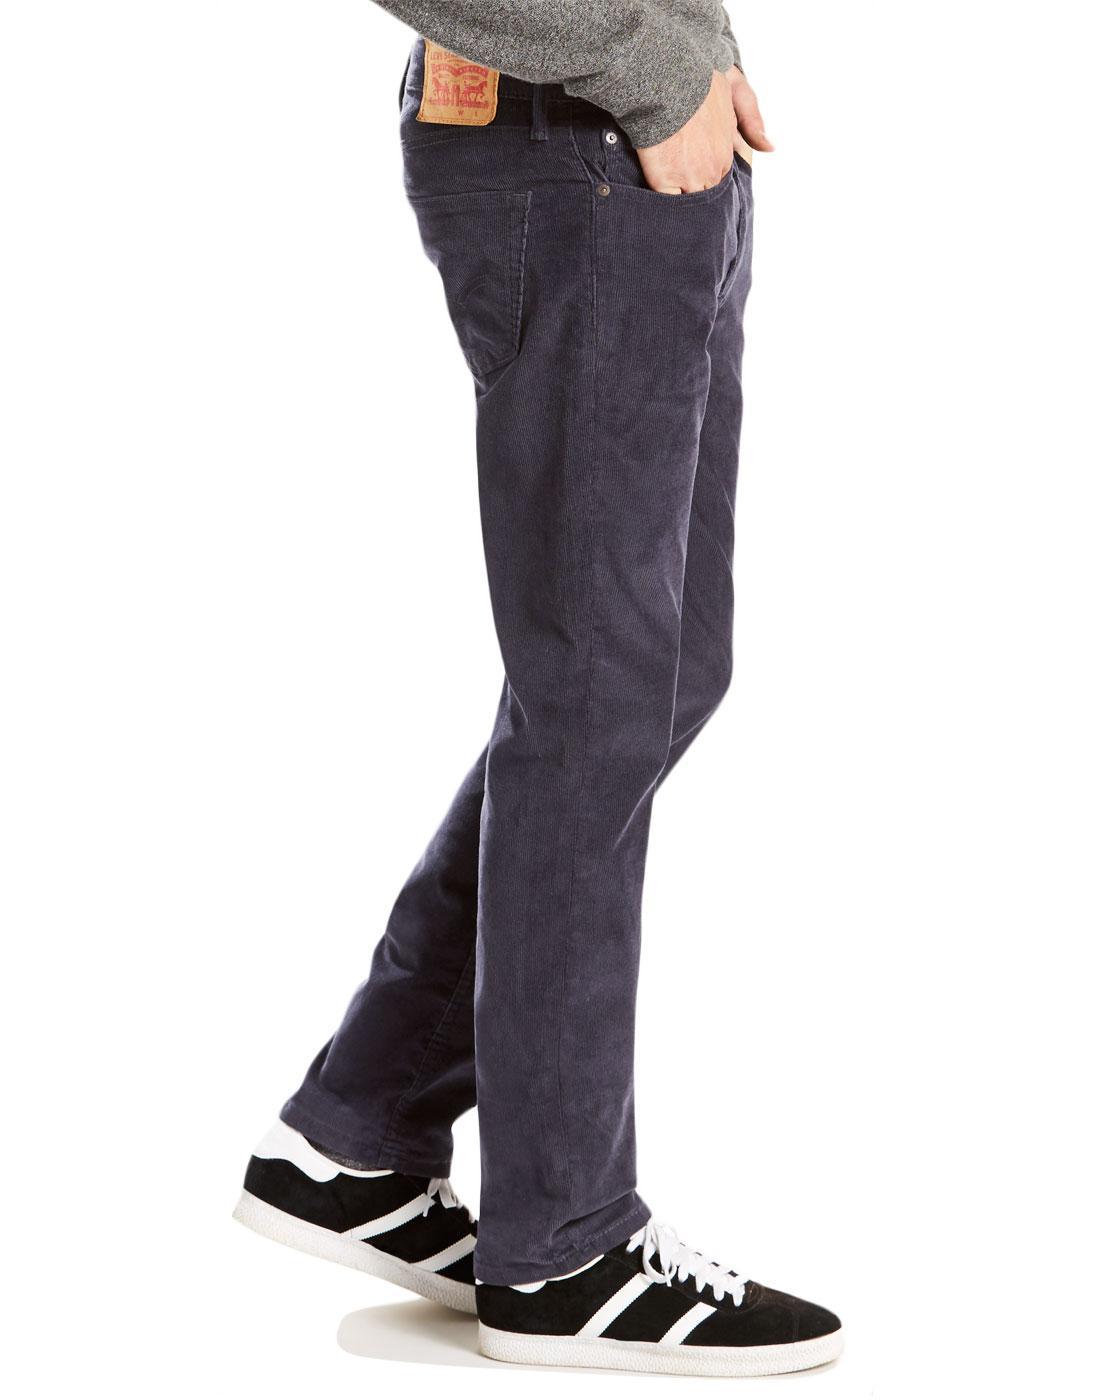 90f75a8f76b74c LEVI'S® 511 Retro Mod 1960s Mens Slim Fit Cord Jeans Nightwatch